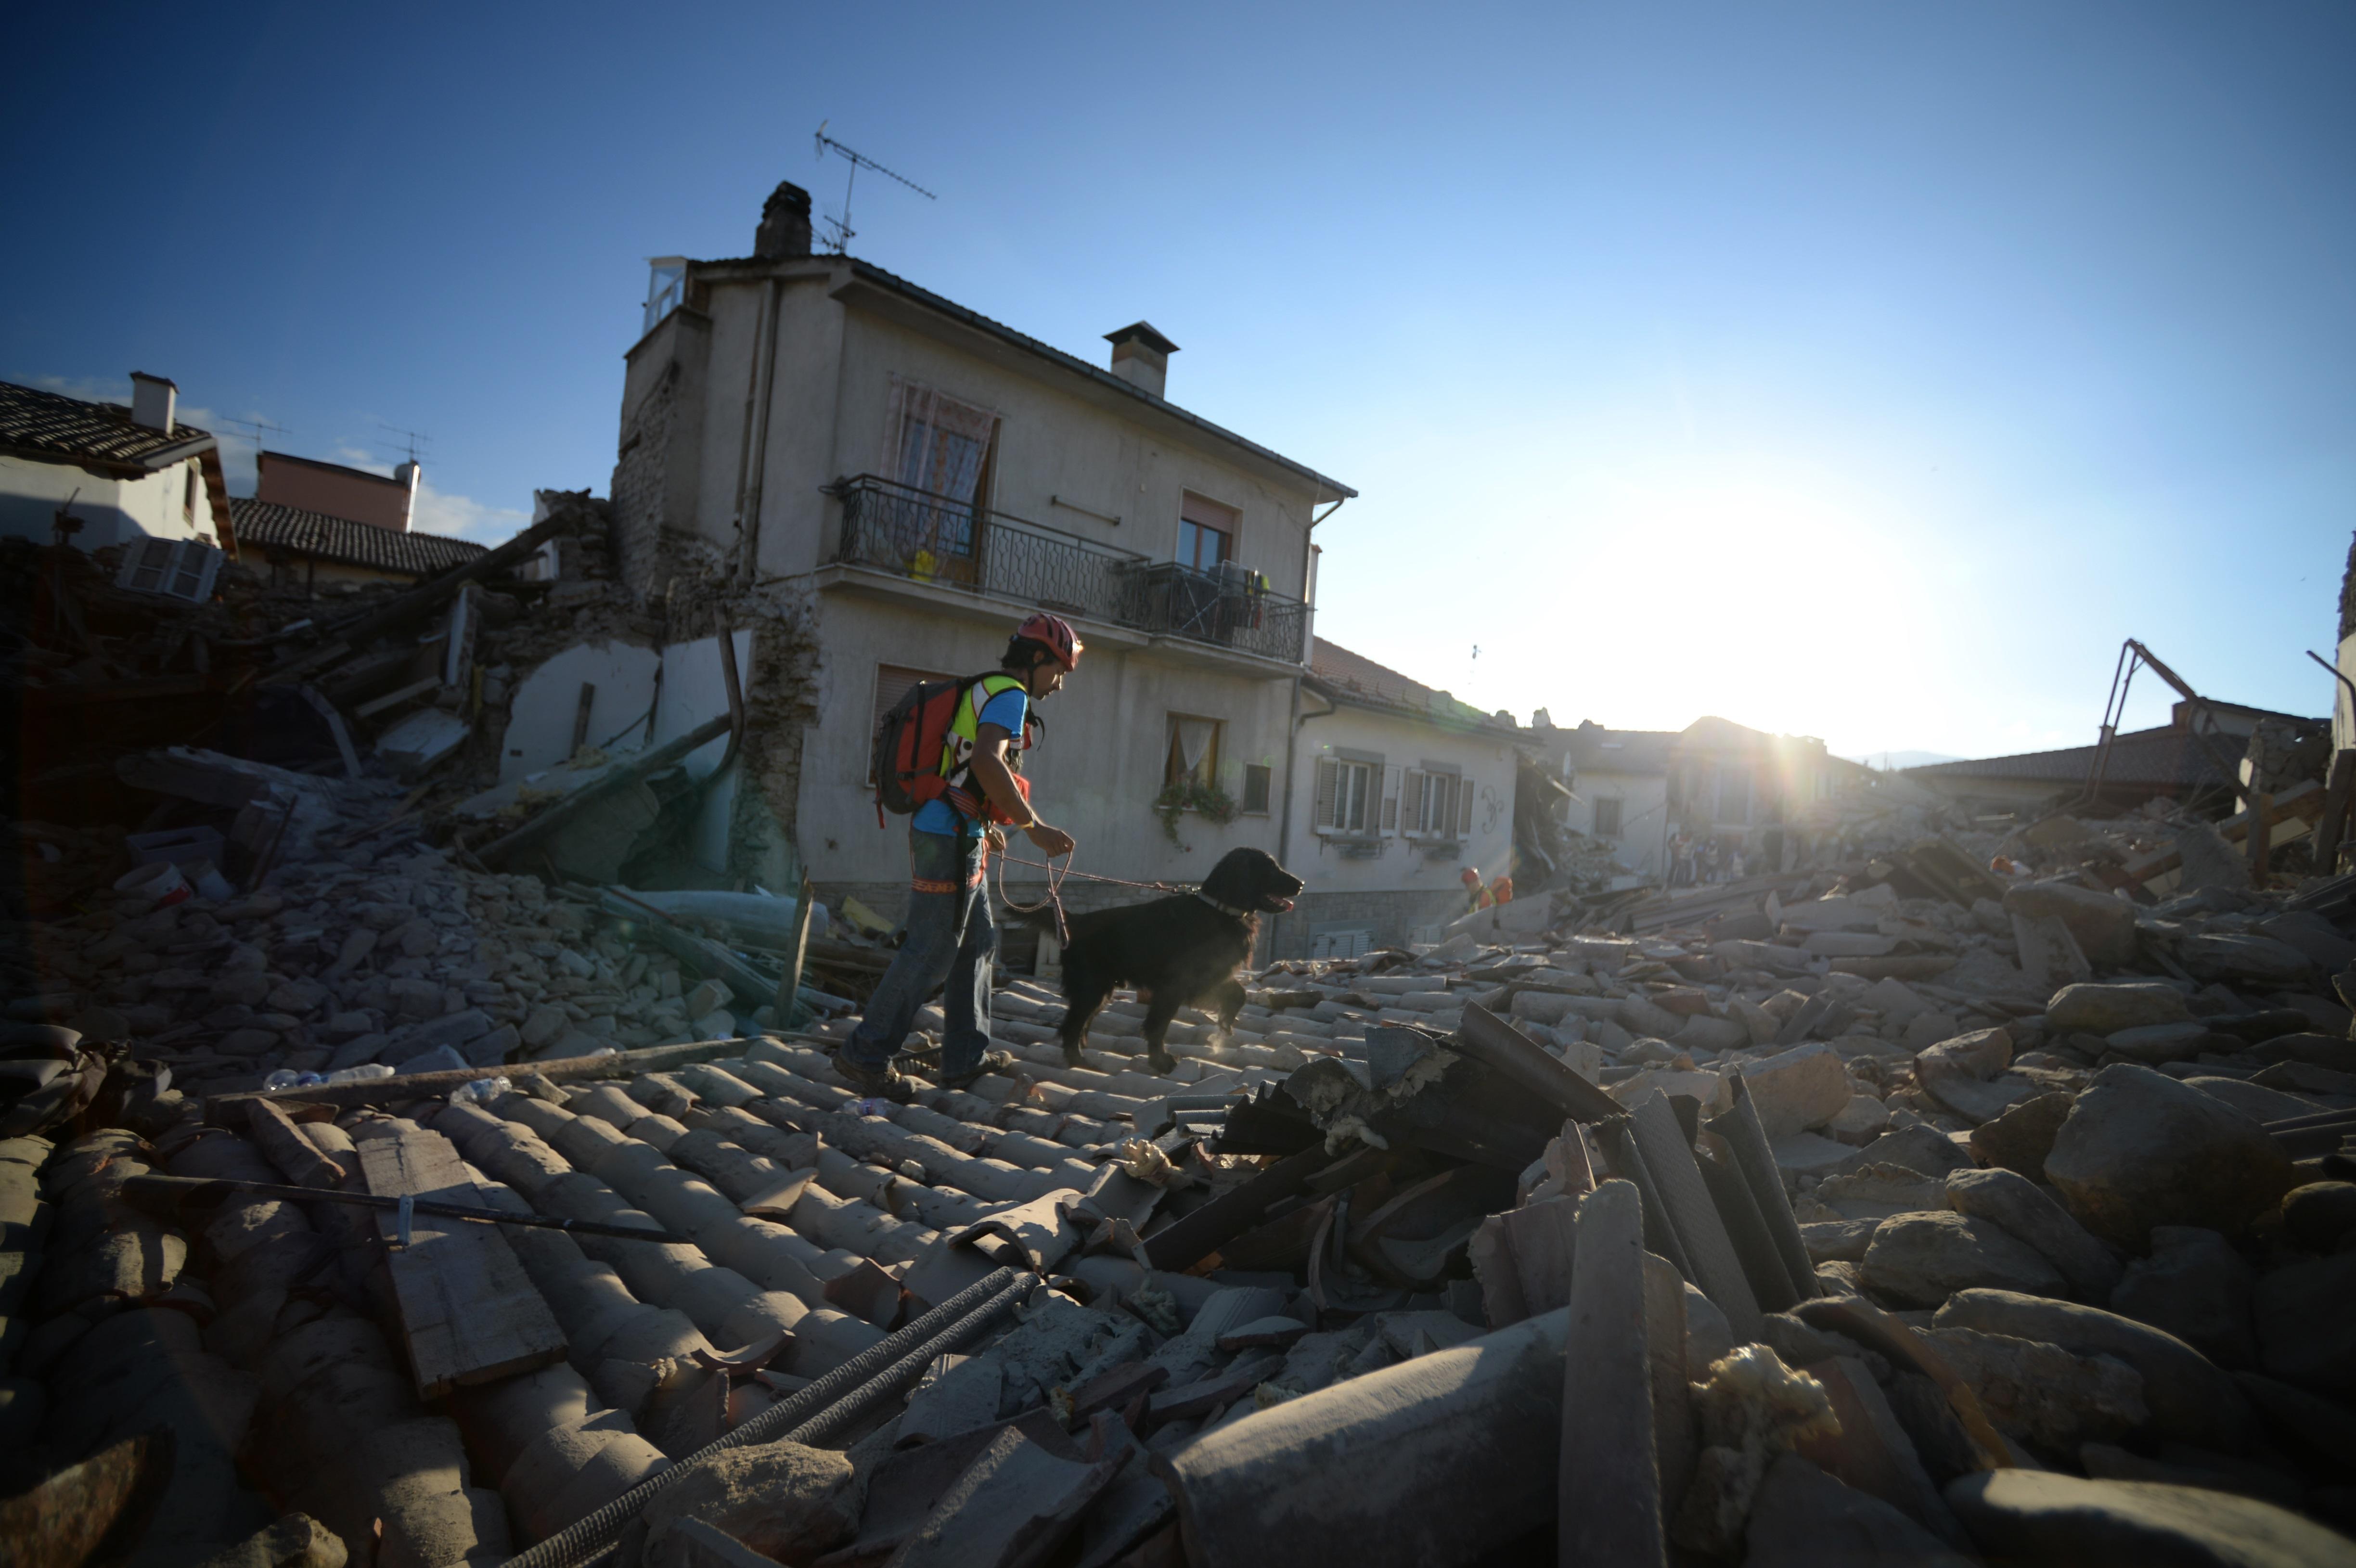 AFP / FILIPPO MONTEFORTE